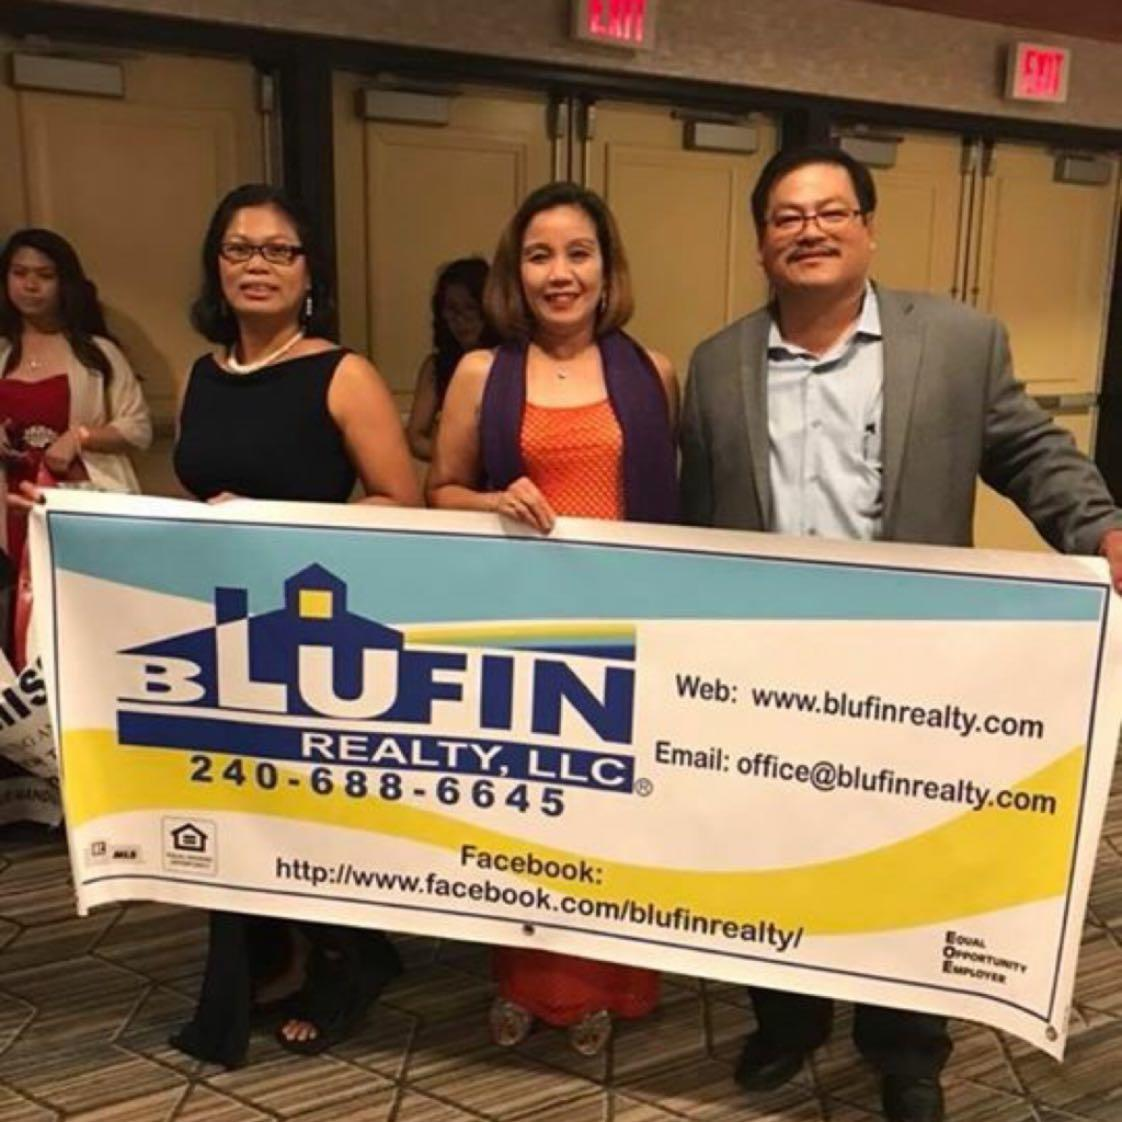 Blufin Realty, LLC image 3